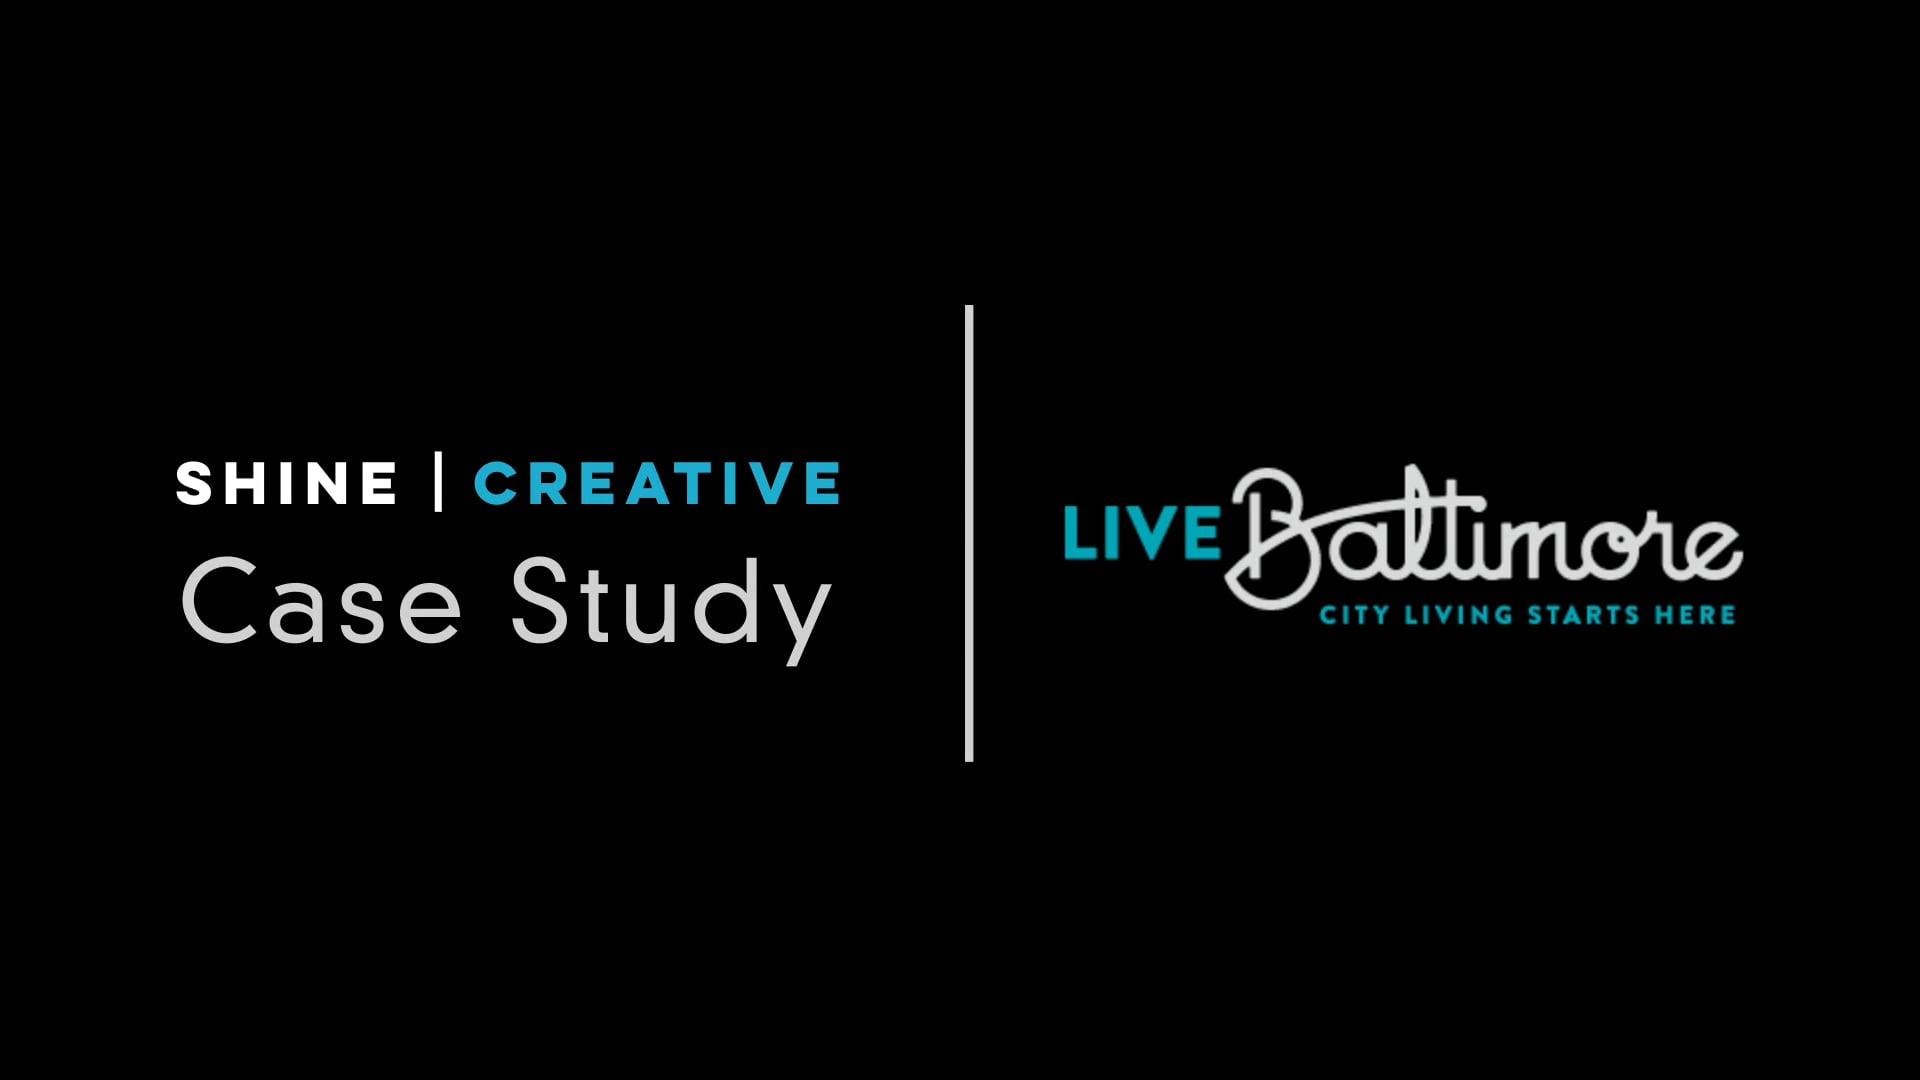 Case Study: Live Baltimore